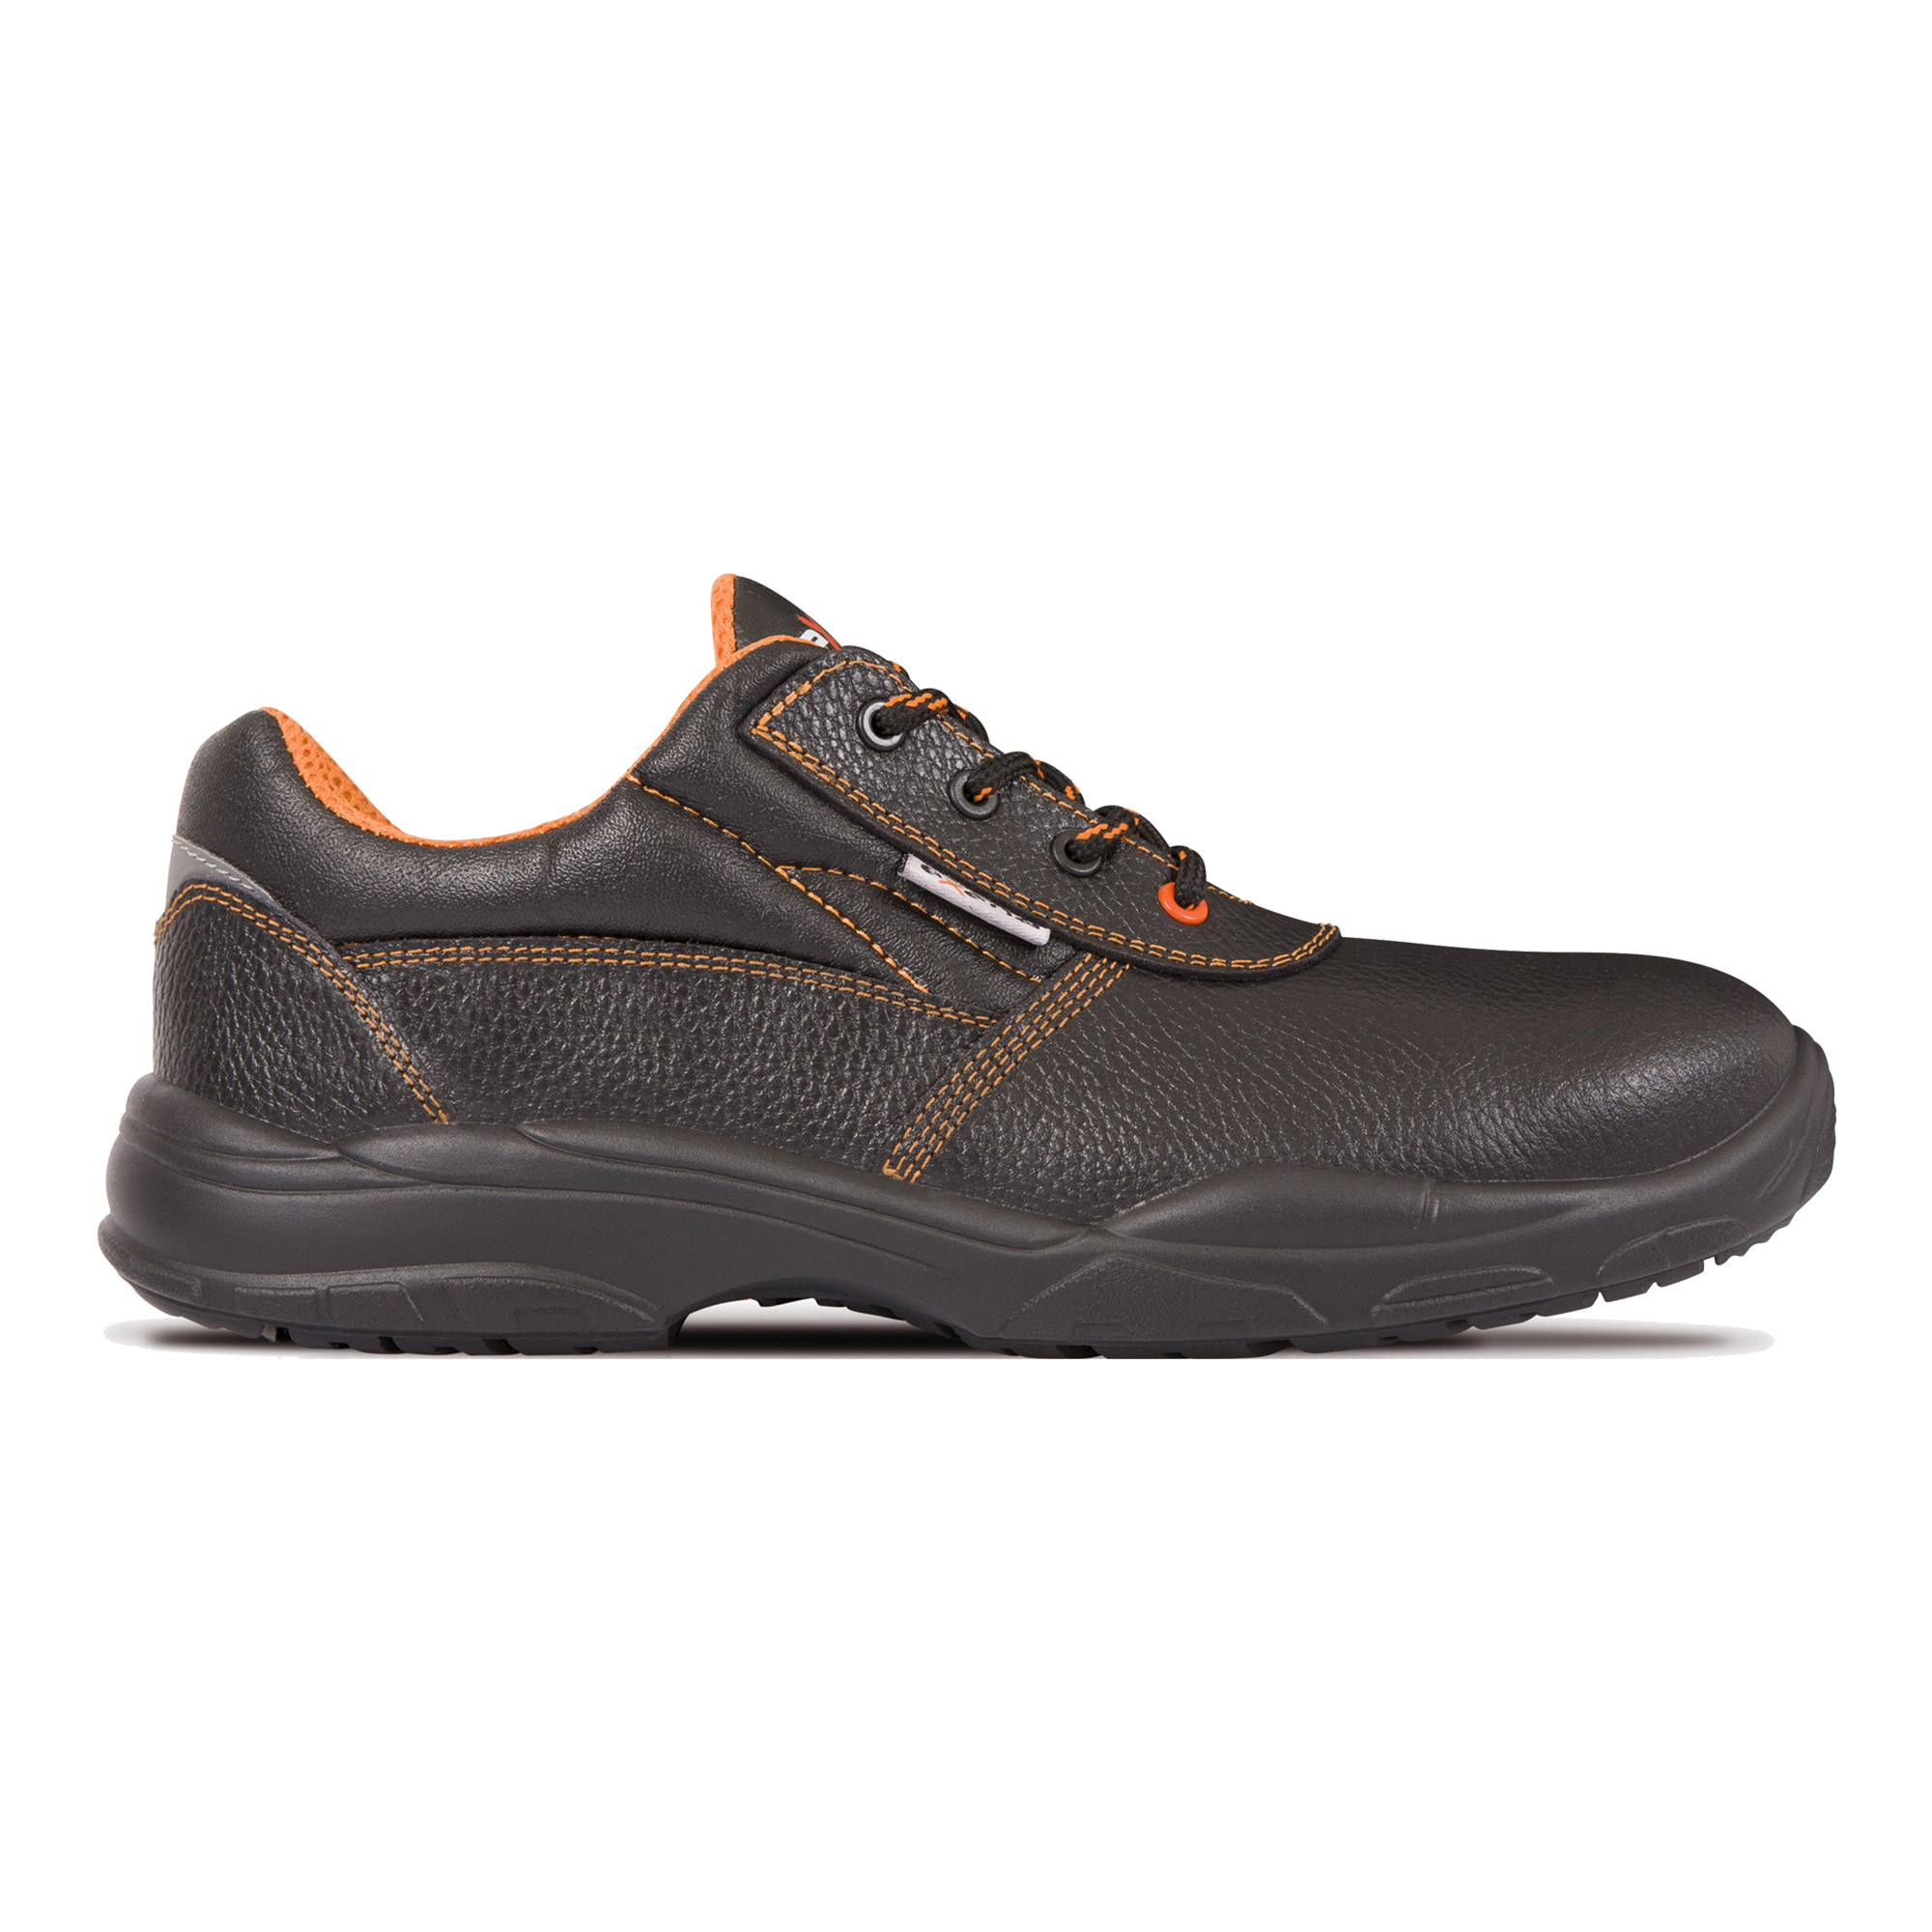 4Walk Nairobi S1+P SRC - zapatos de seguridad ligeros - azul - talla 36 M2Hhf0RI2